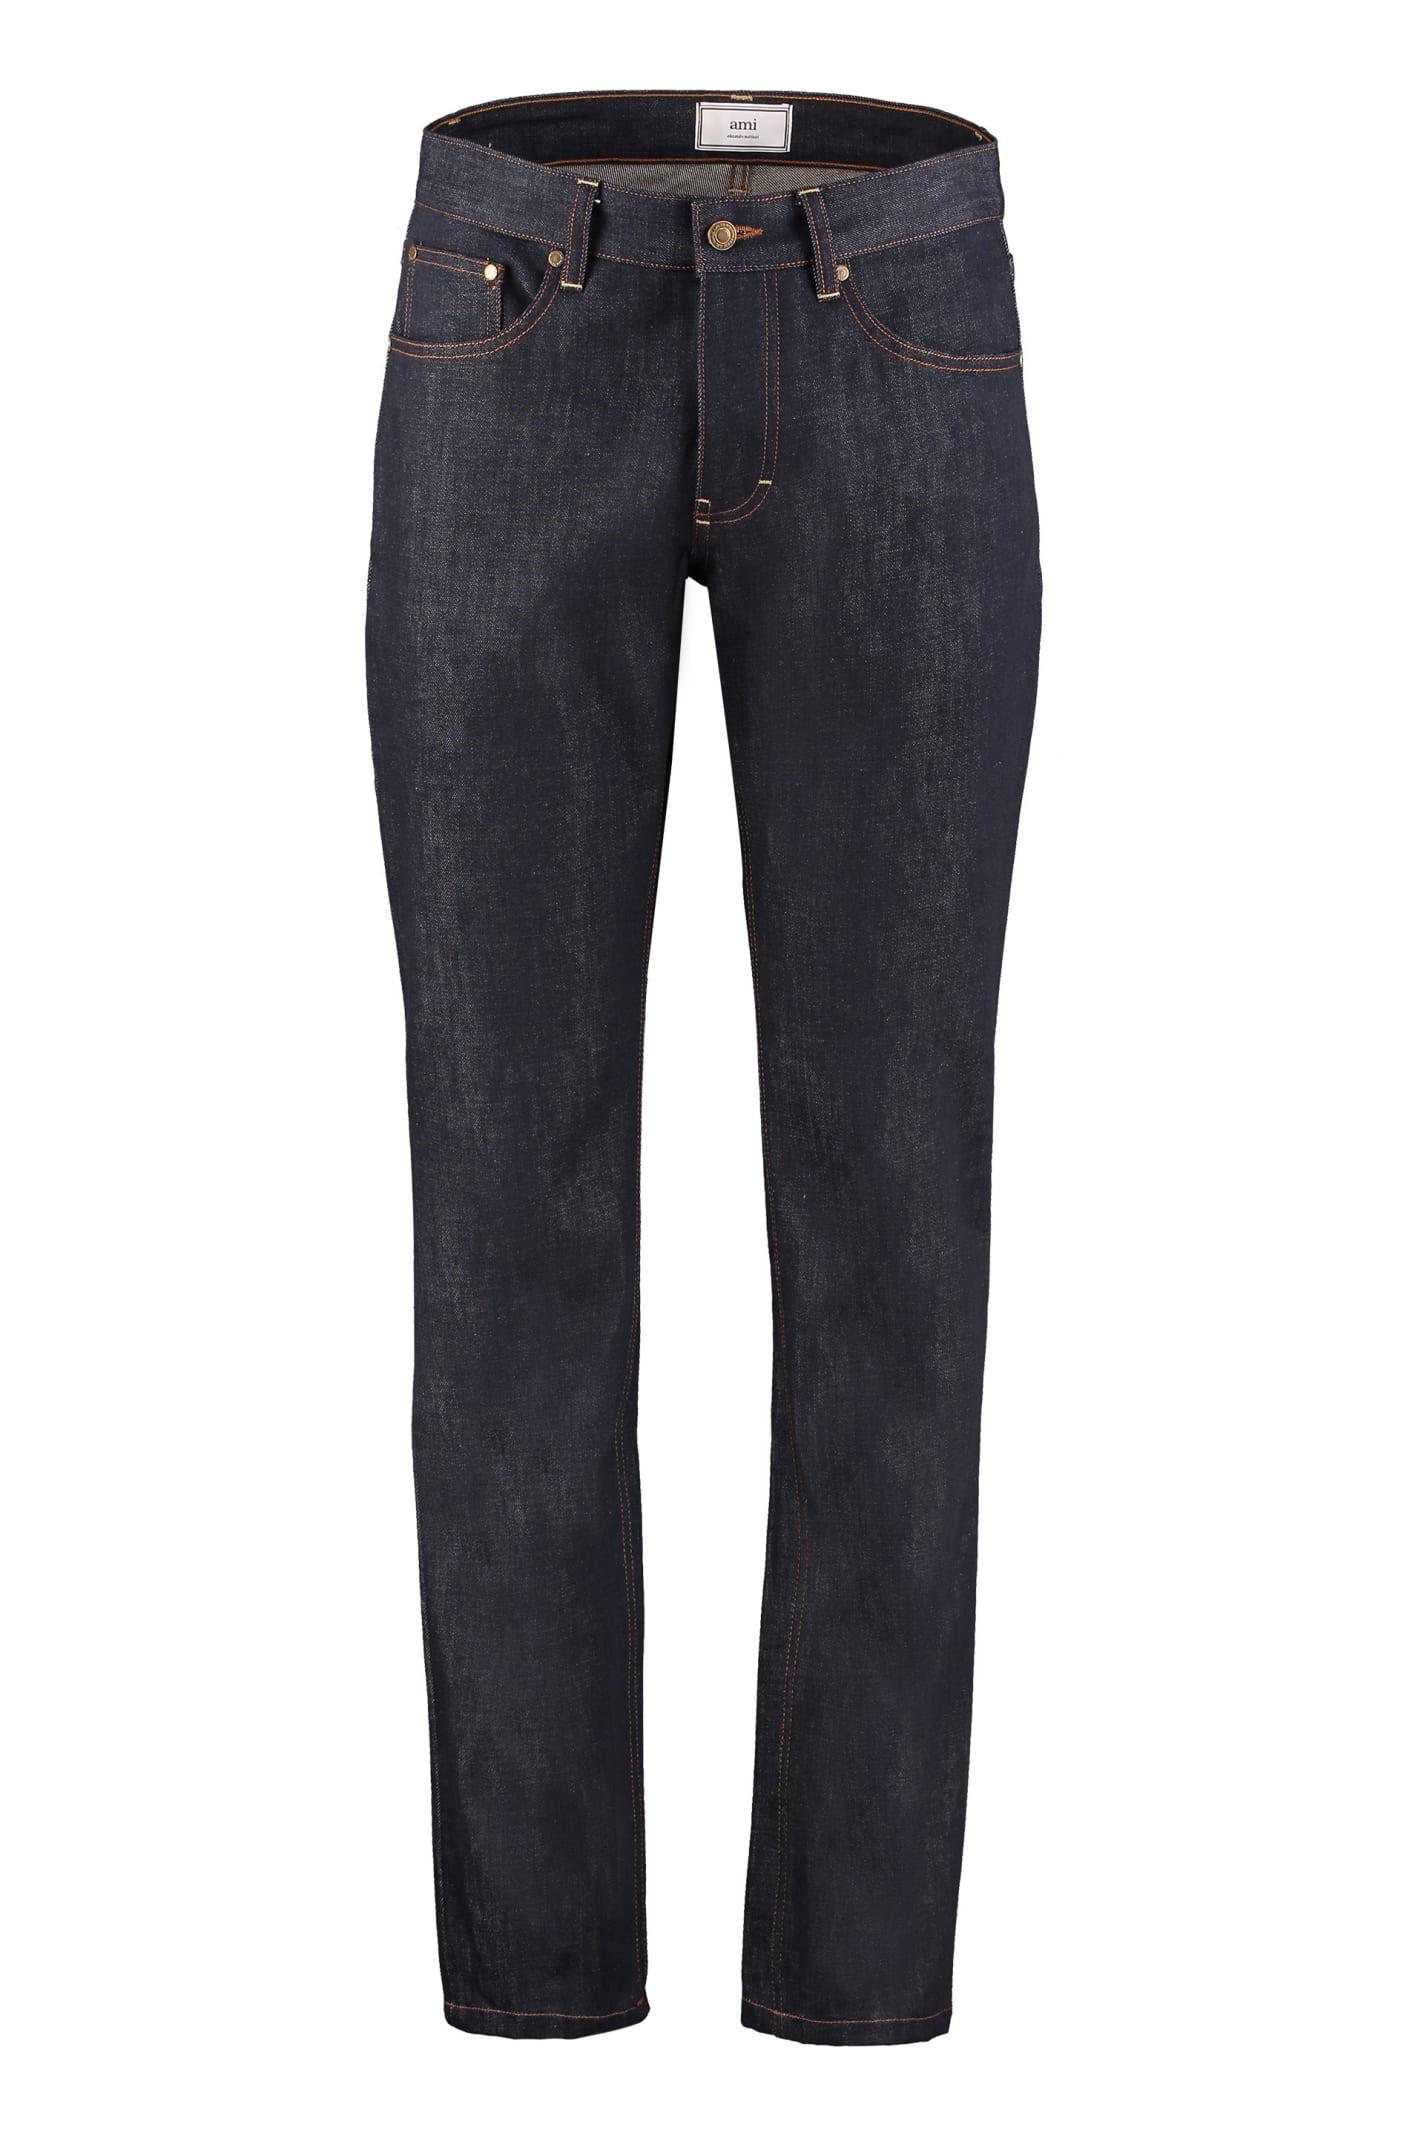 Ami Alexandre Mattiussi 5-pocket Jeans In Denim